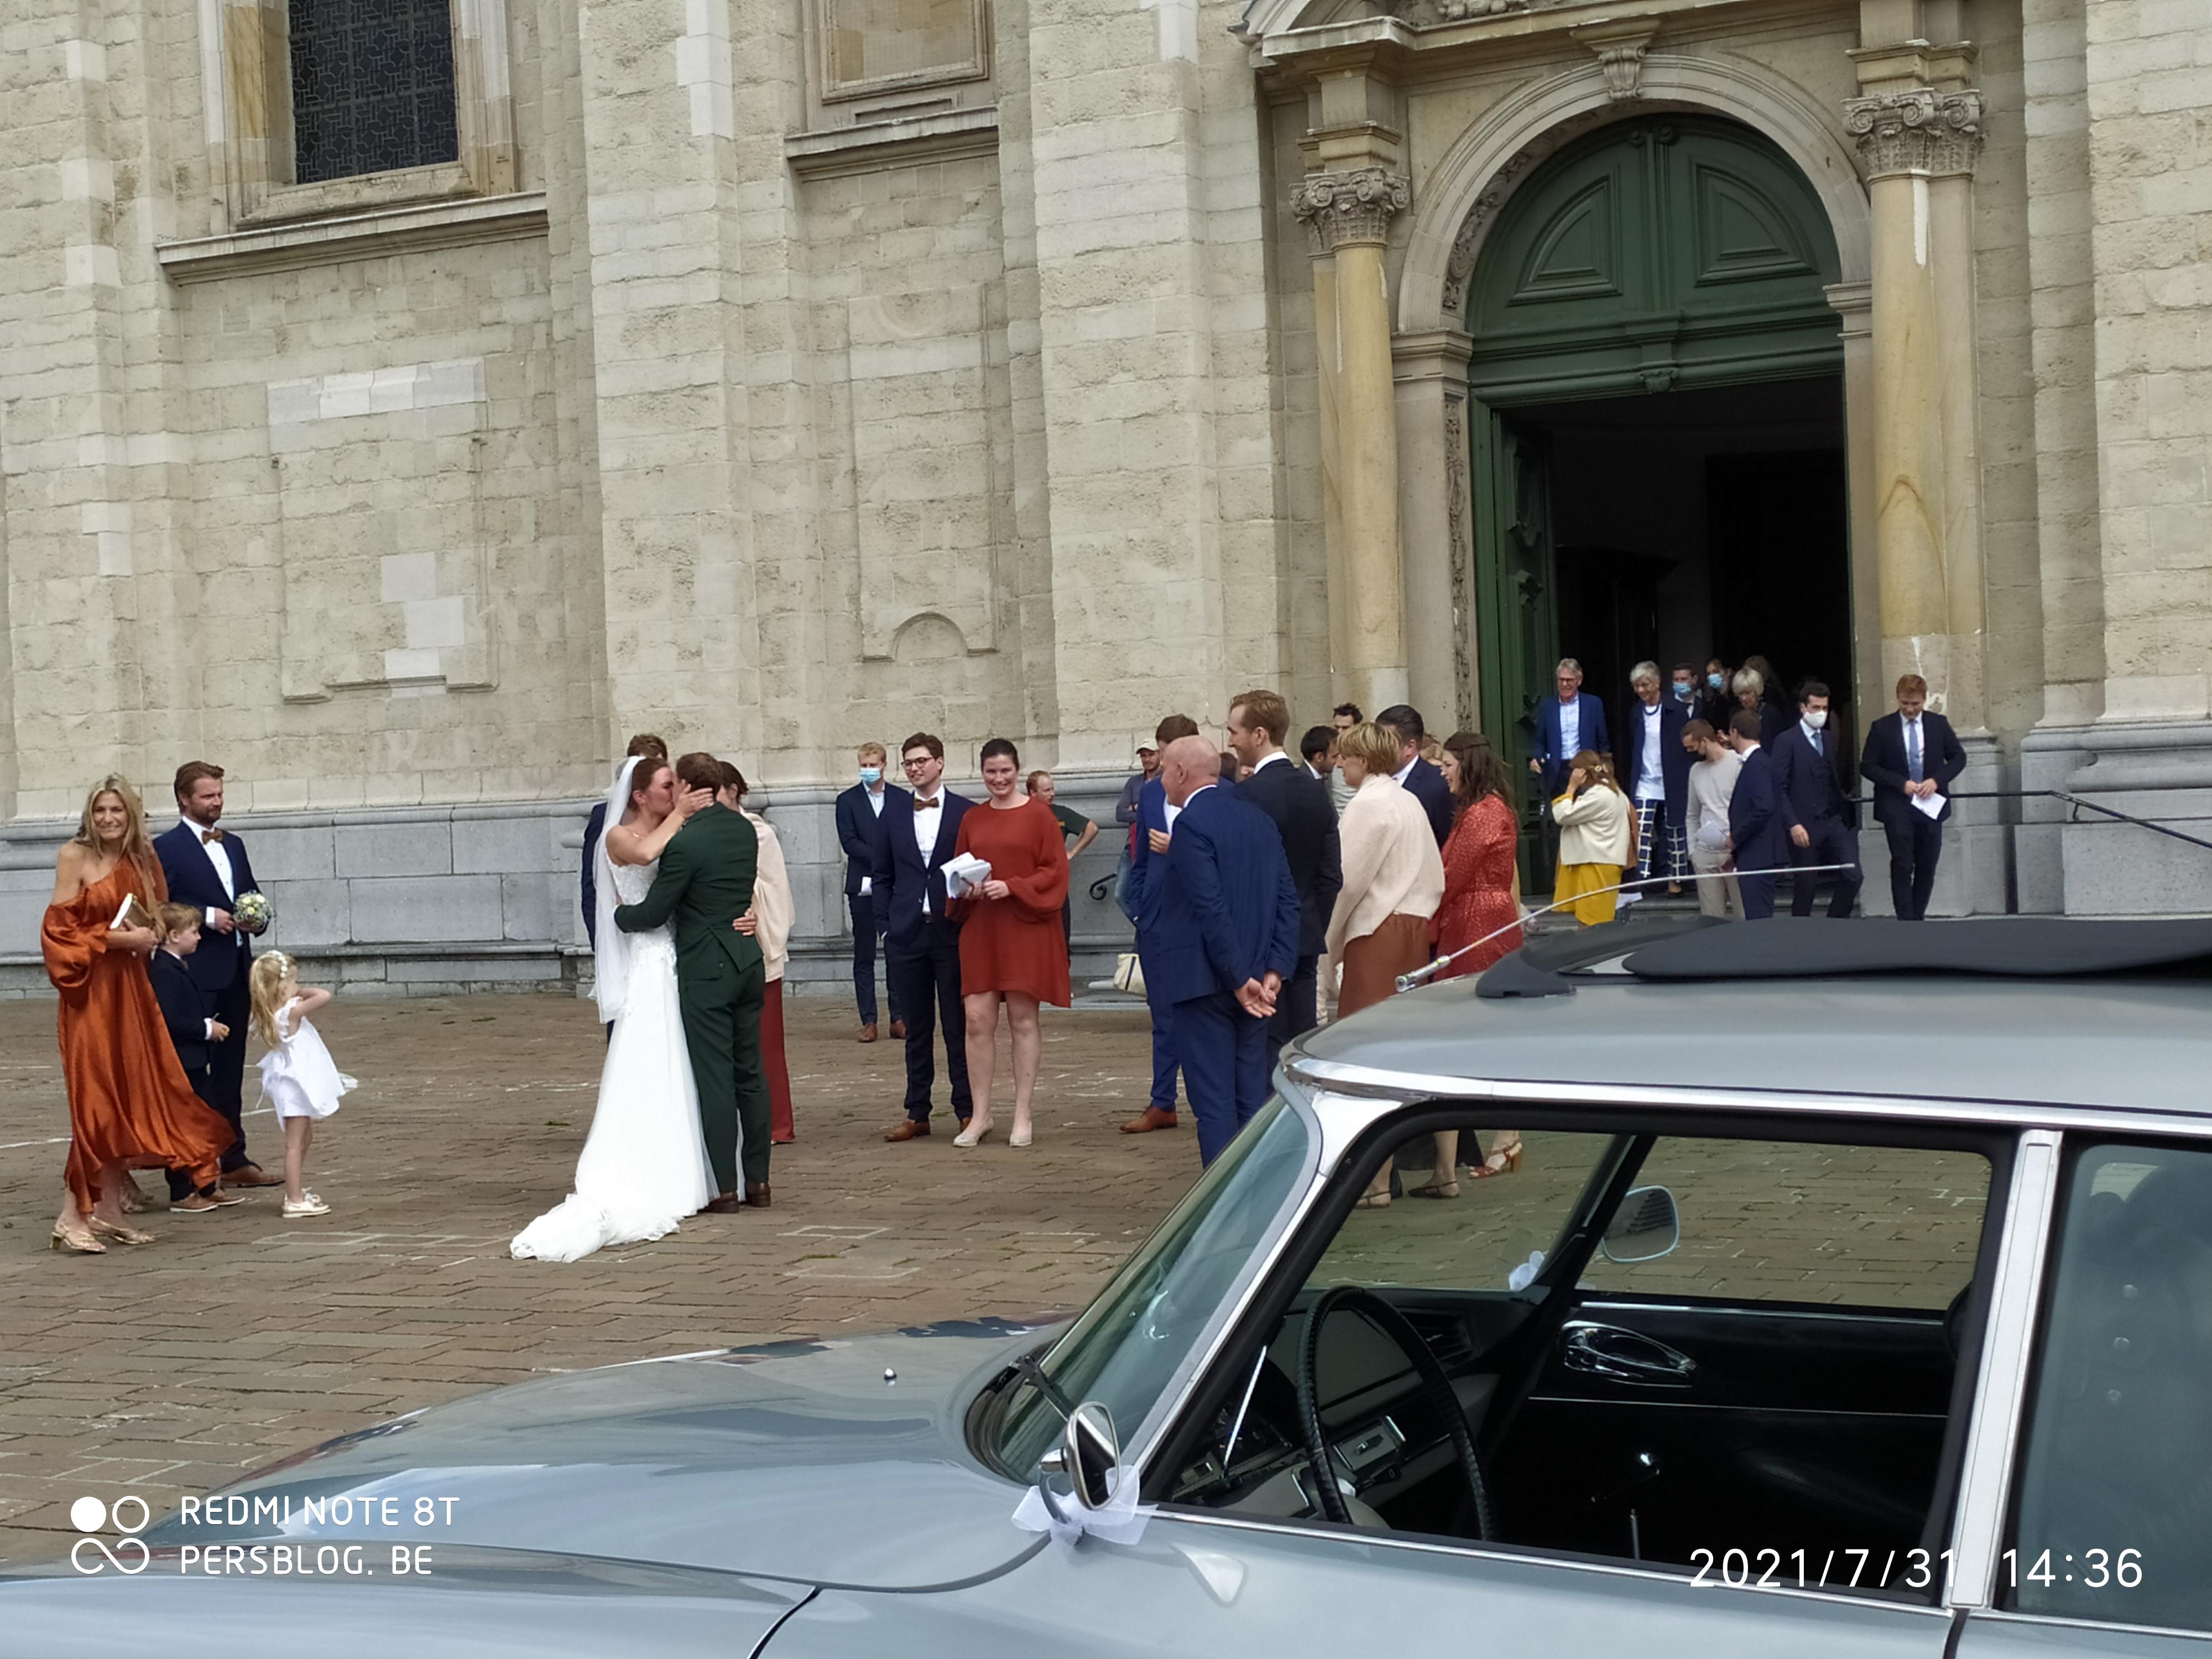 9 Sint-Pietersplein - Sint-Pieterskerk - huwelijk - oldtimers IMG_20210731_143611 (15)